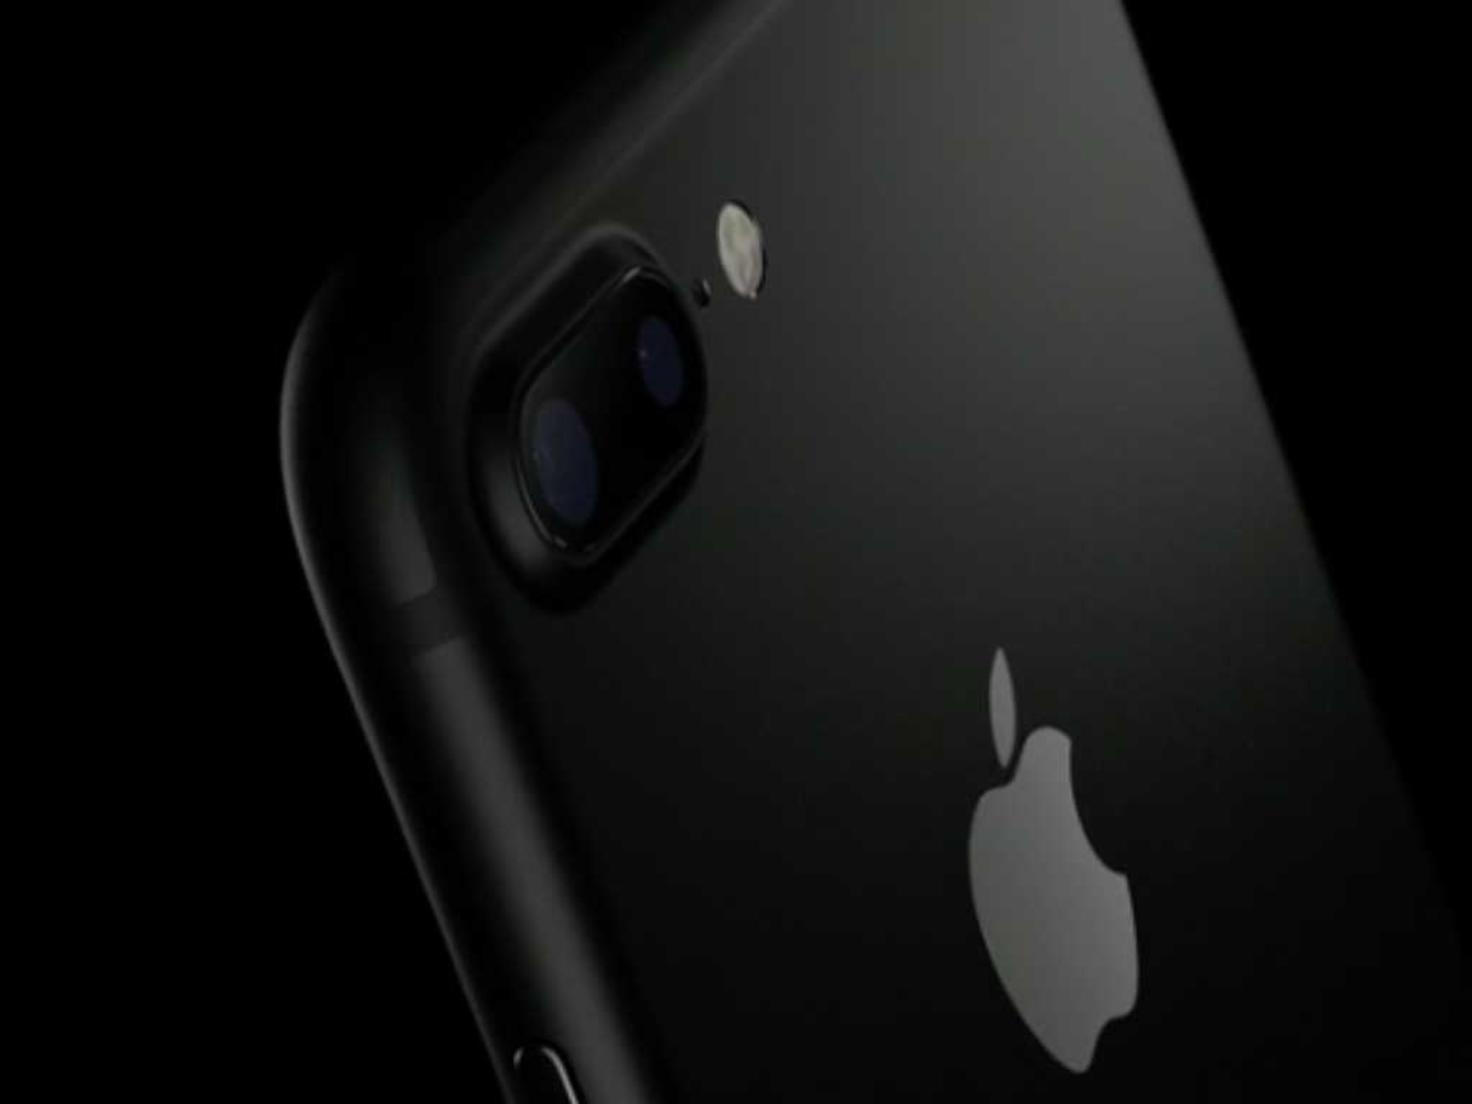 iPhone7Plus-1024x768.jpg